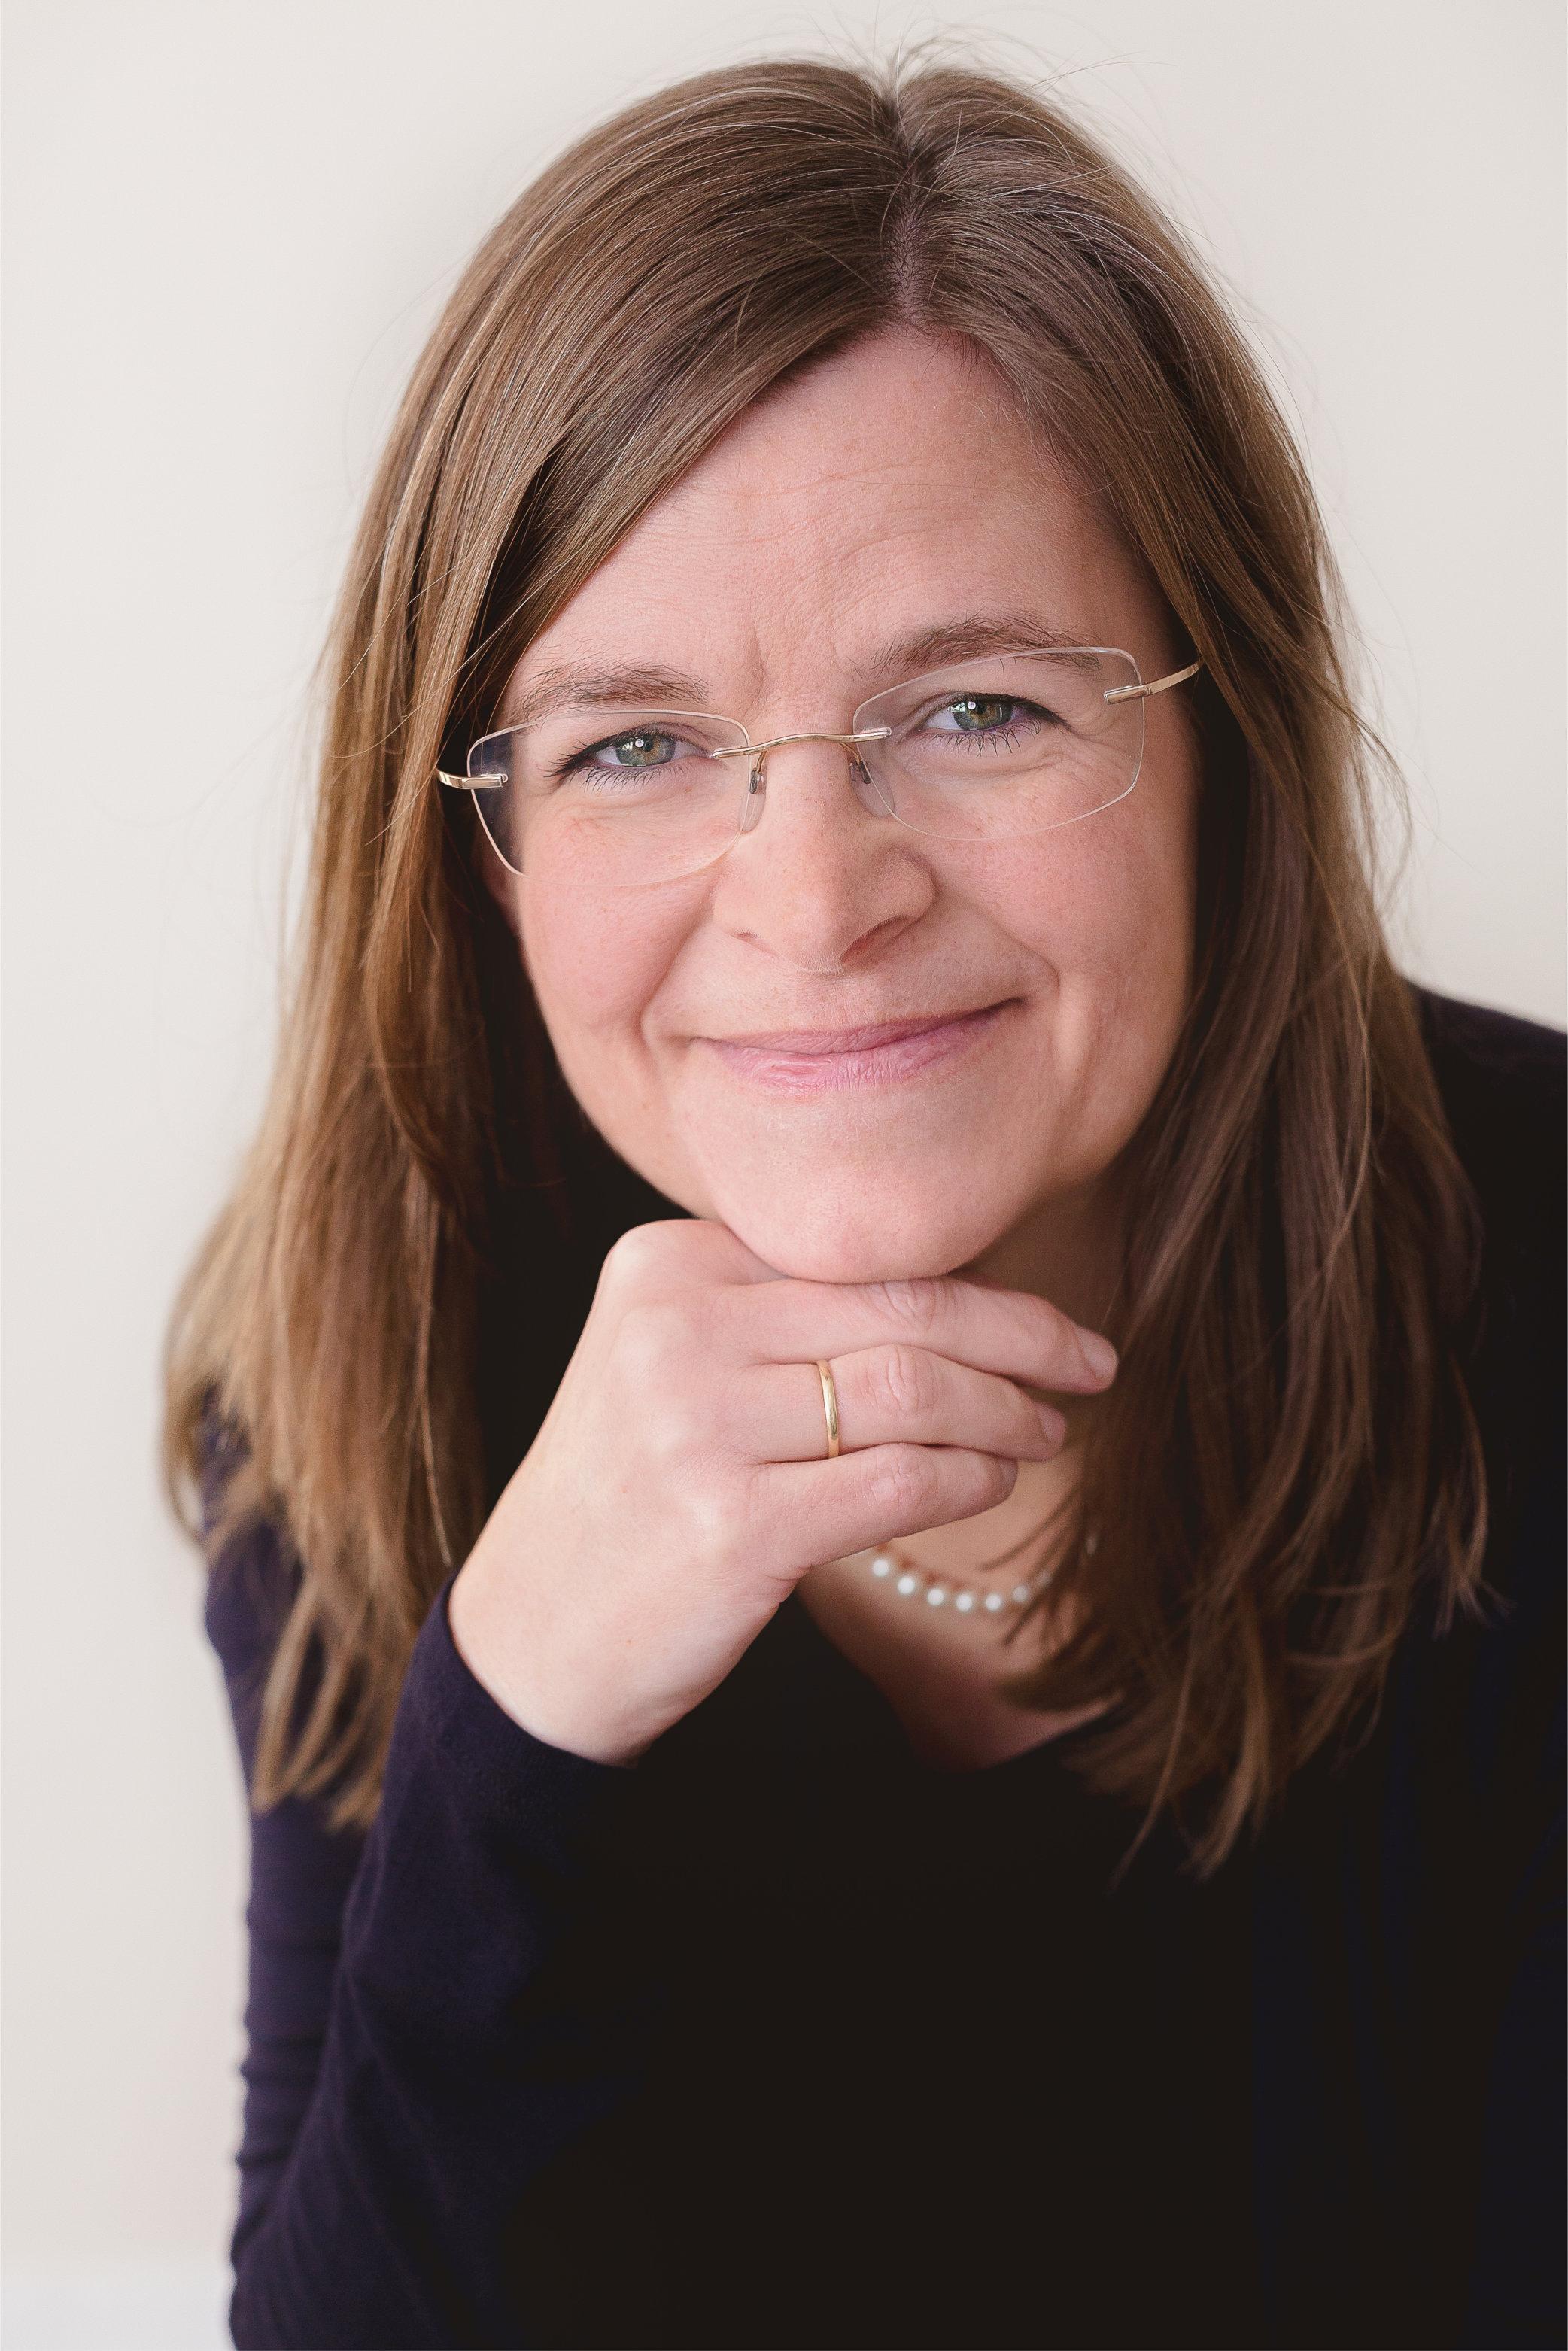 Manuela Poeschl